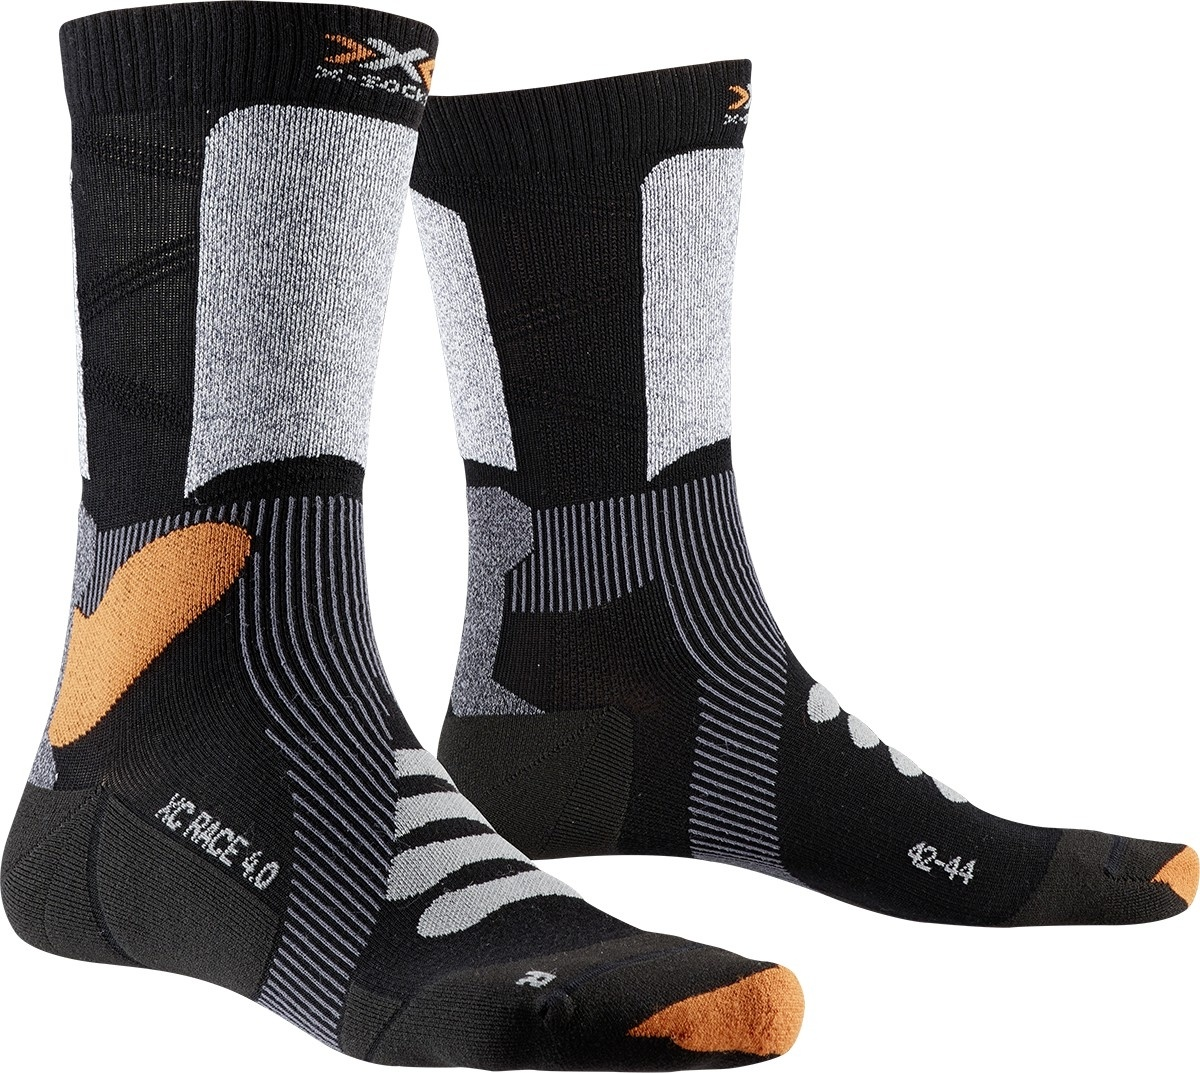 x-socks langlaufen